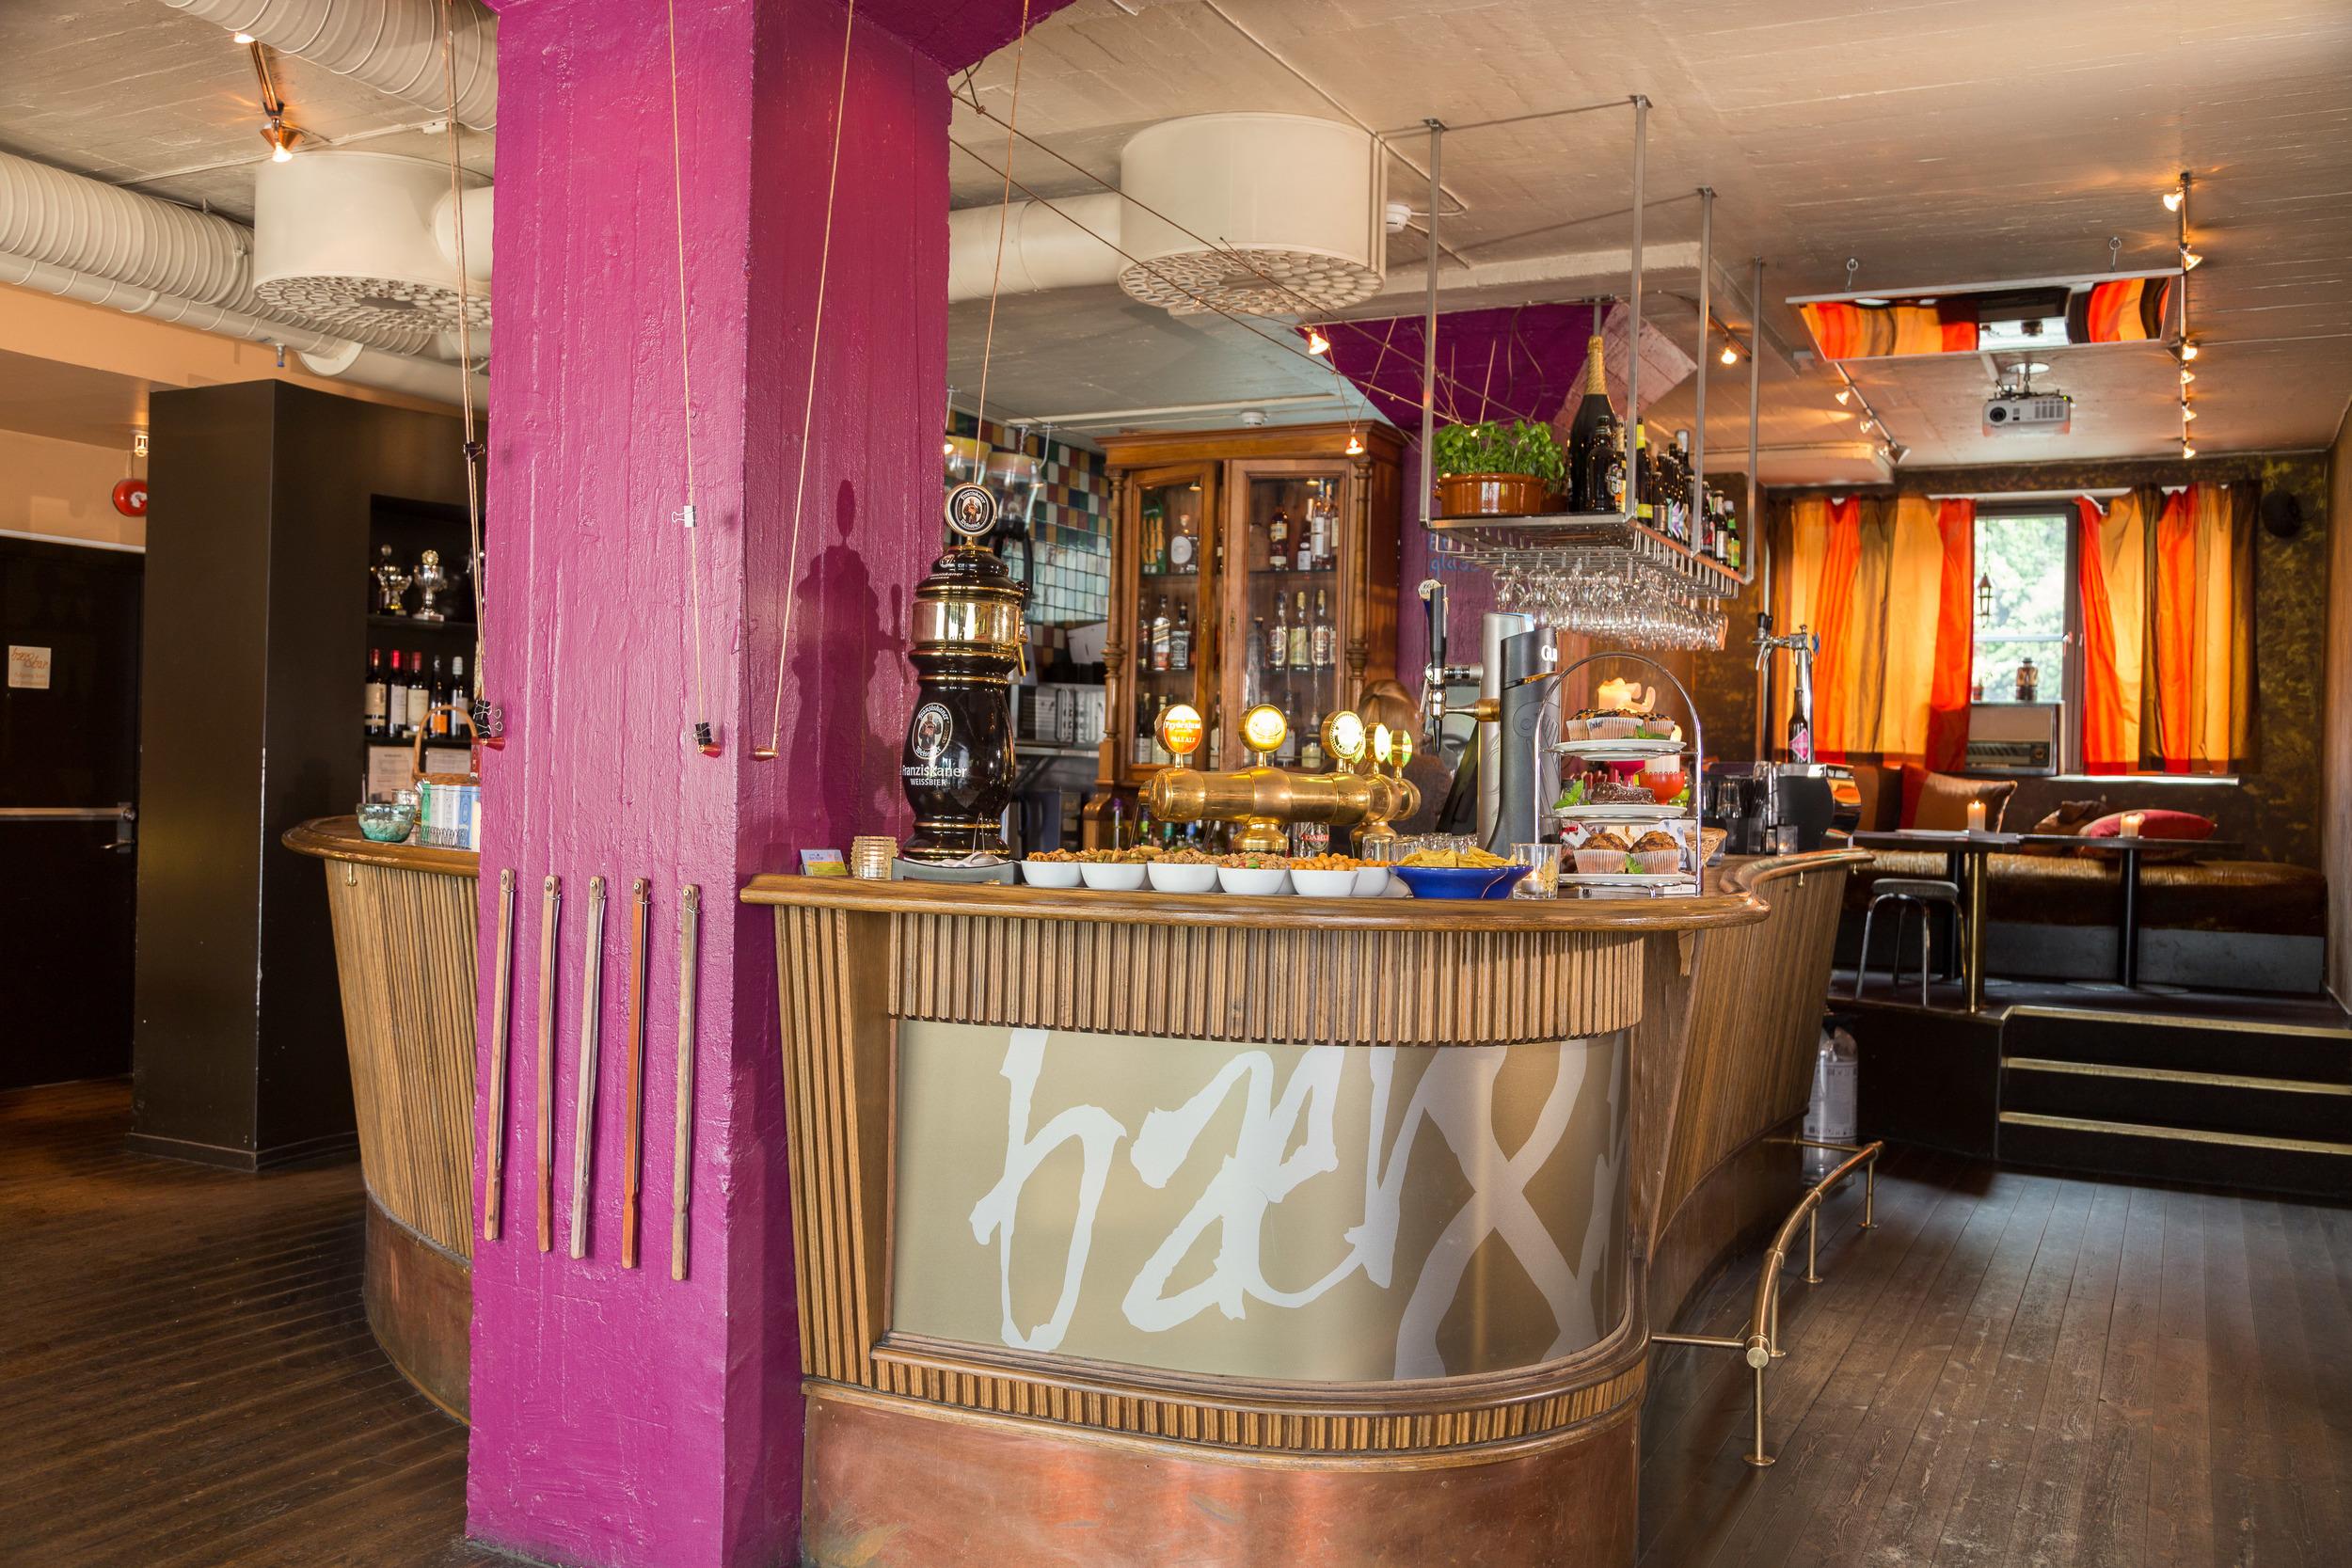 Cafe-bare-blåbær-bær-og-bar-trondheim-norge-46.jpg